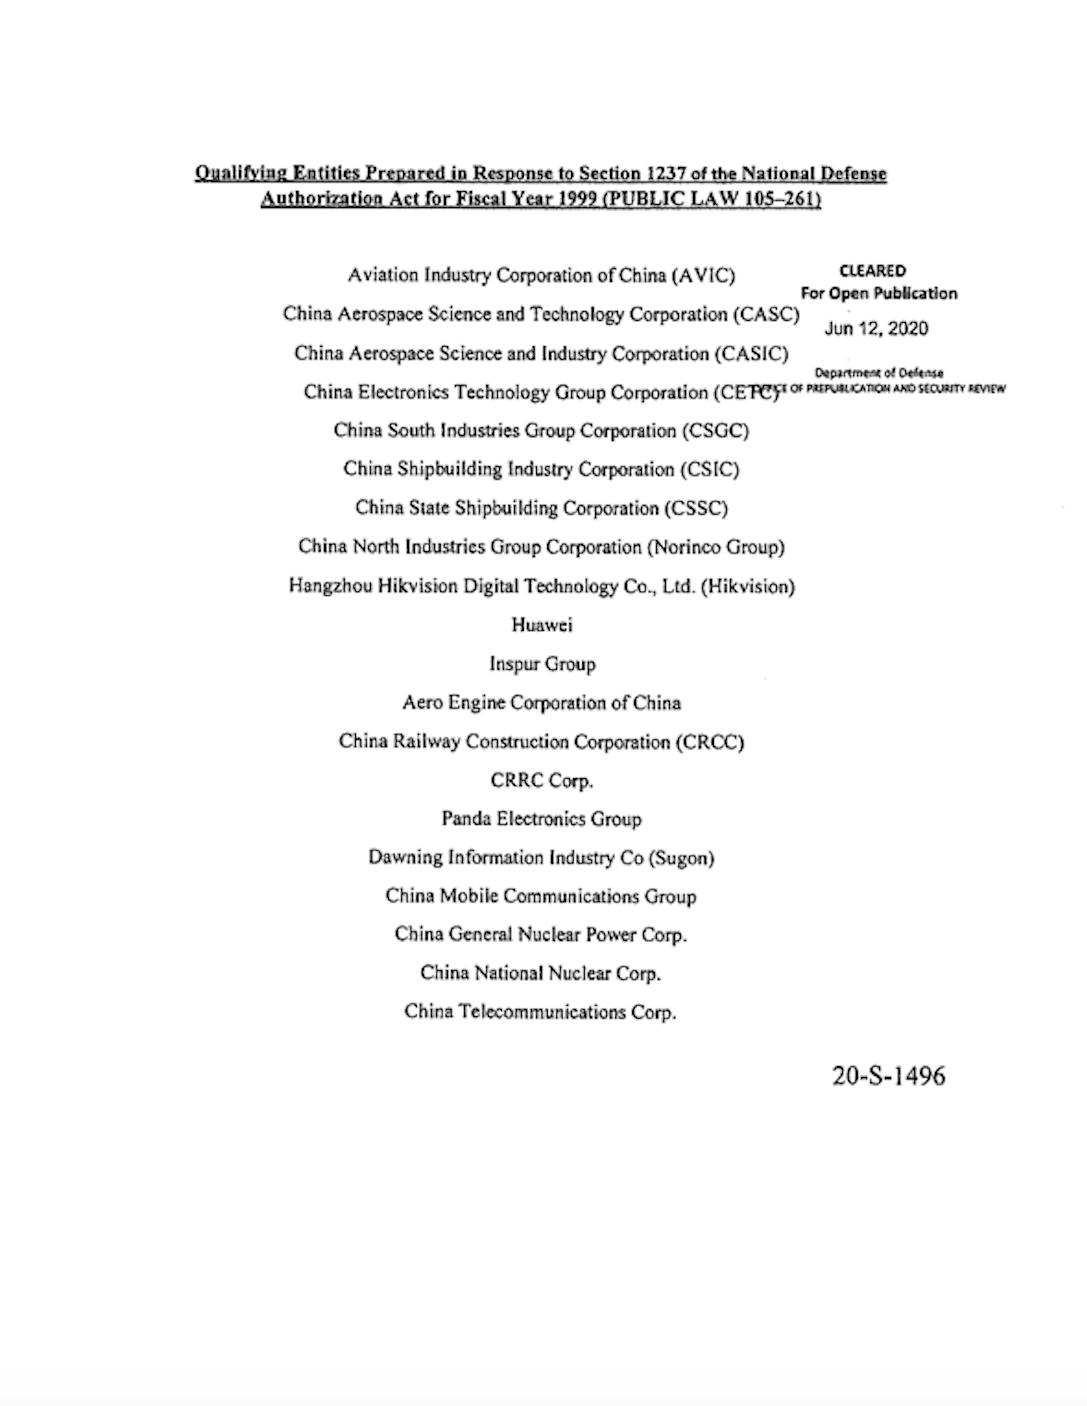 Intel customer Inspur DoD list